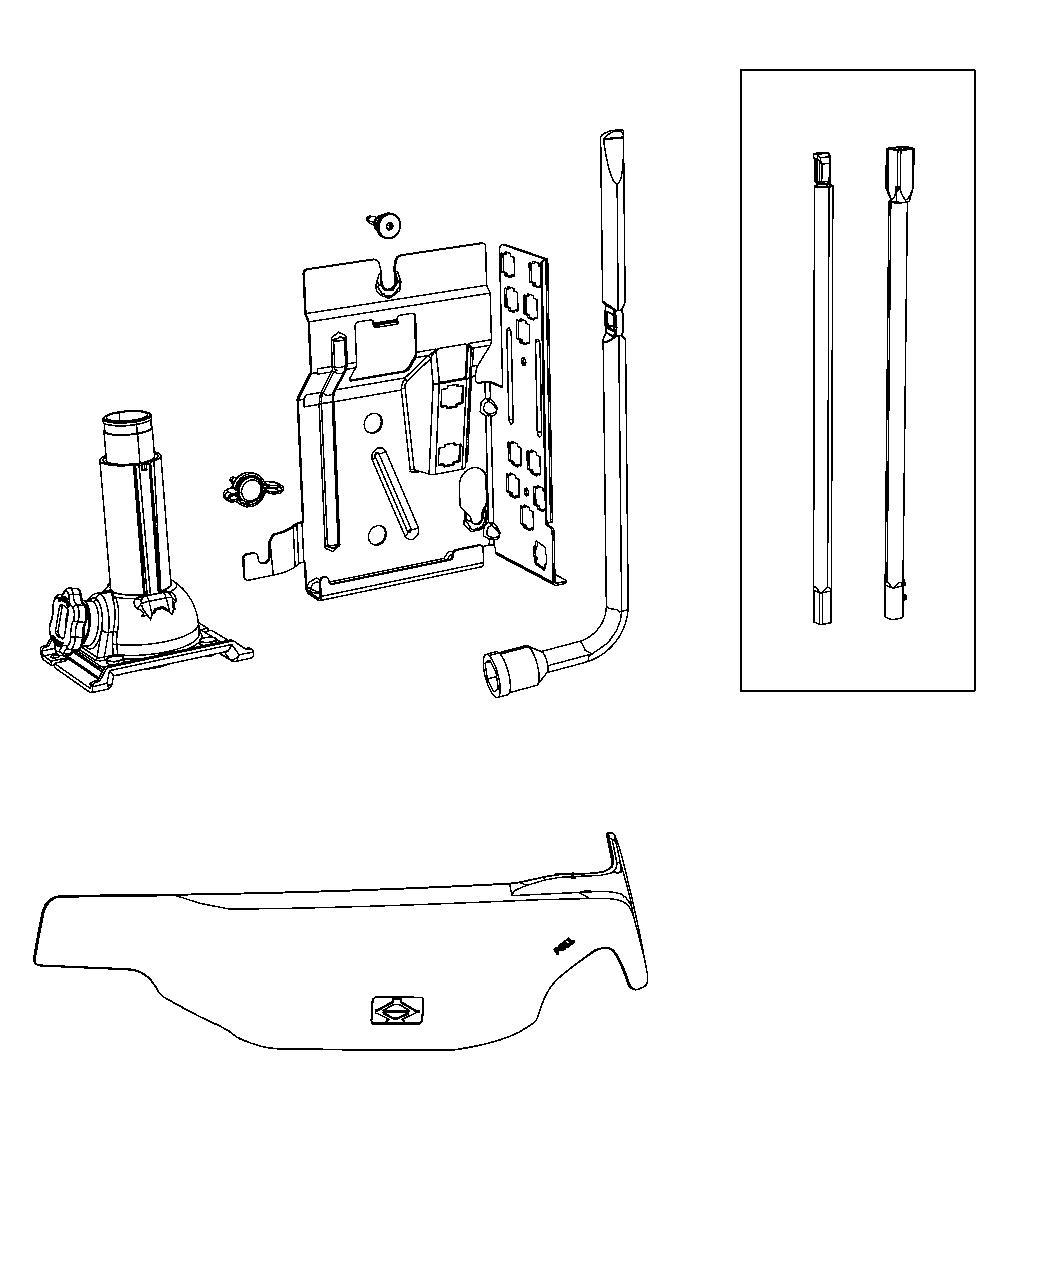 Dodge Ram Wrench Wheel Lug Nut Full Size Spare